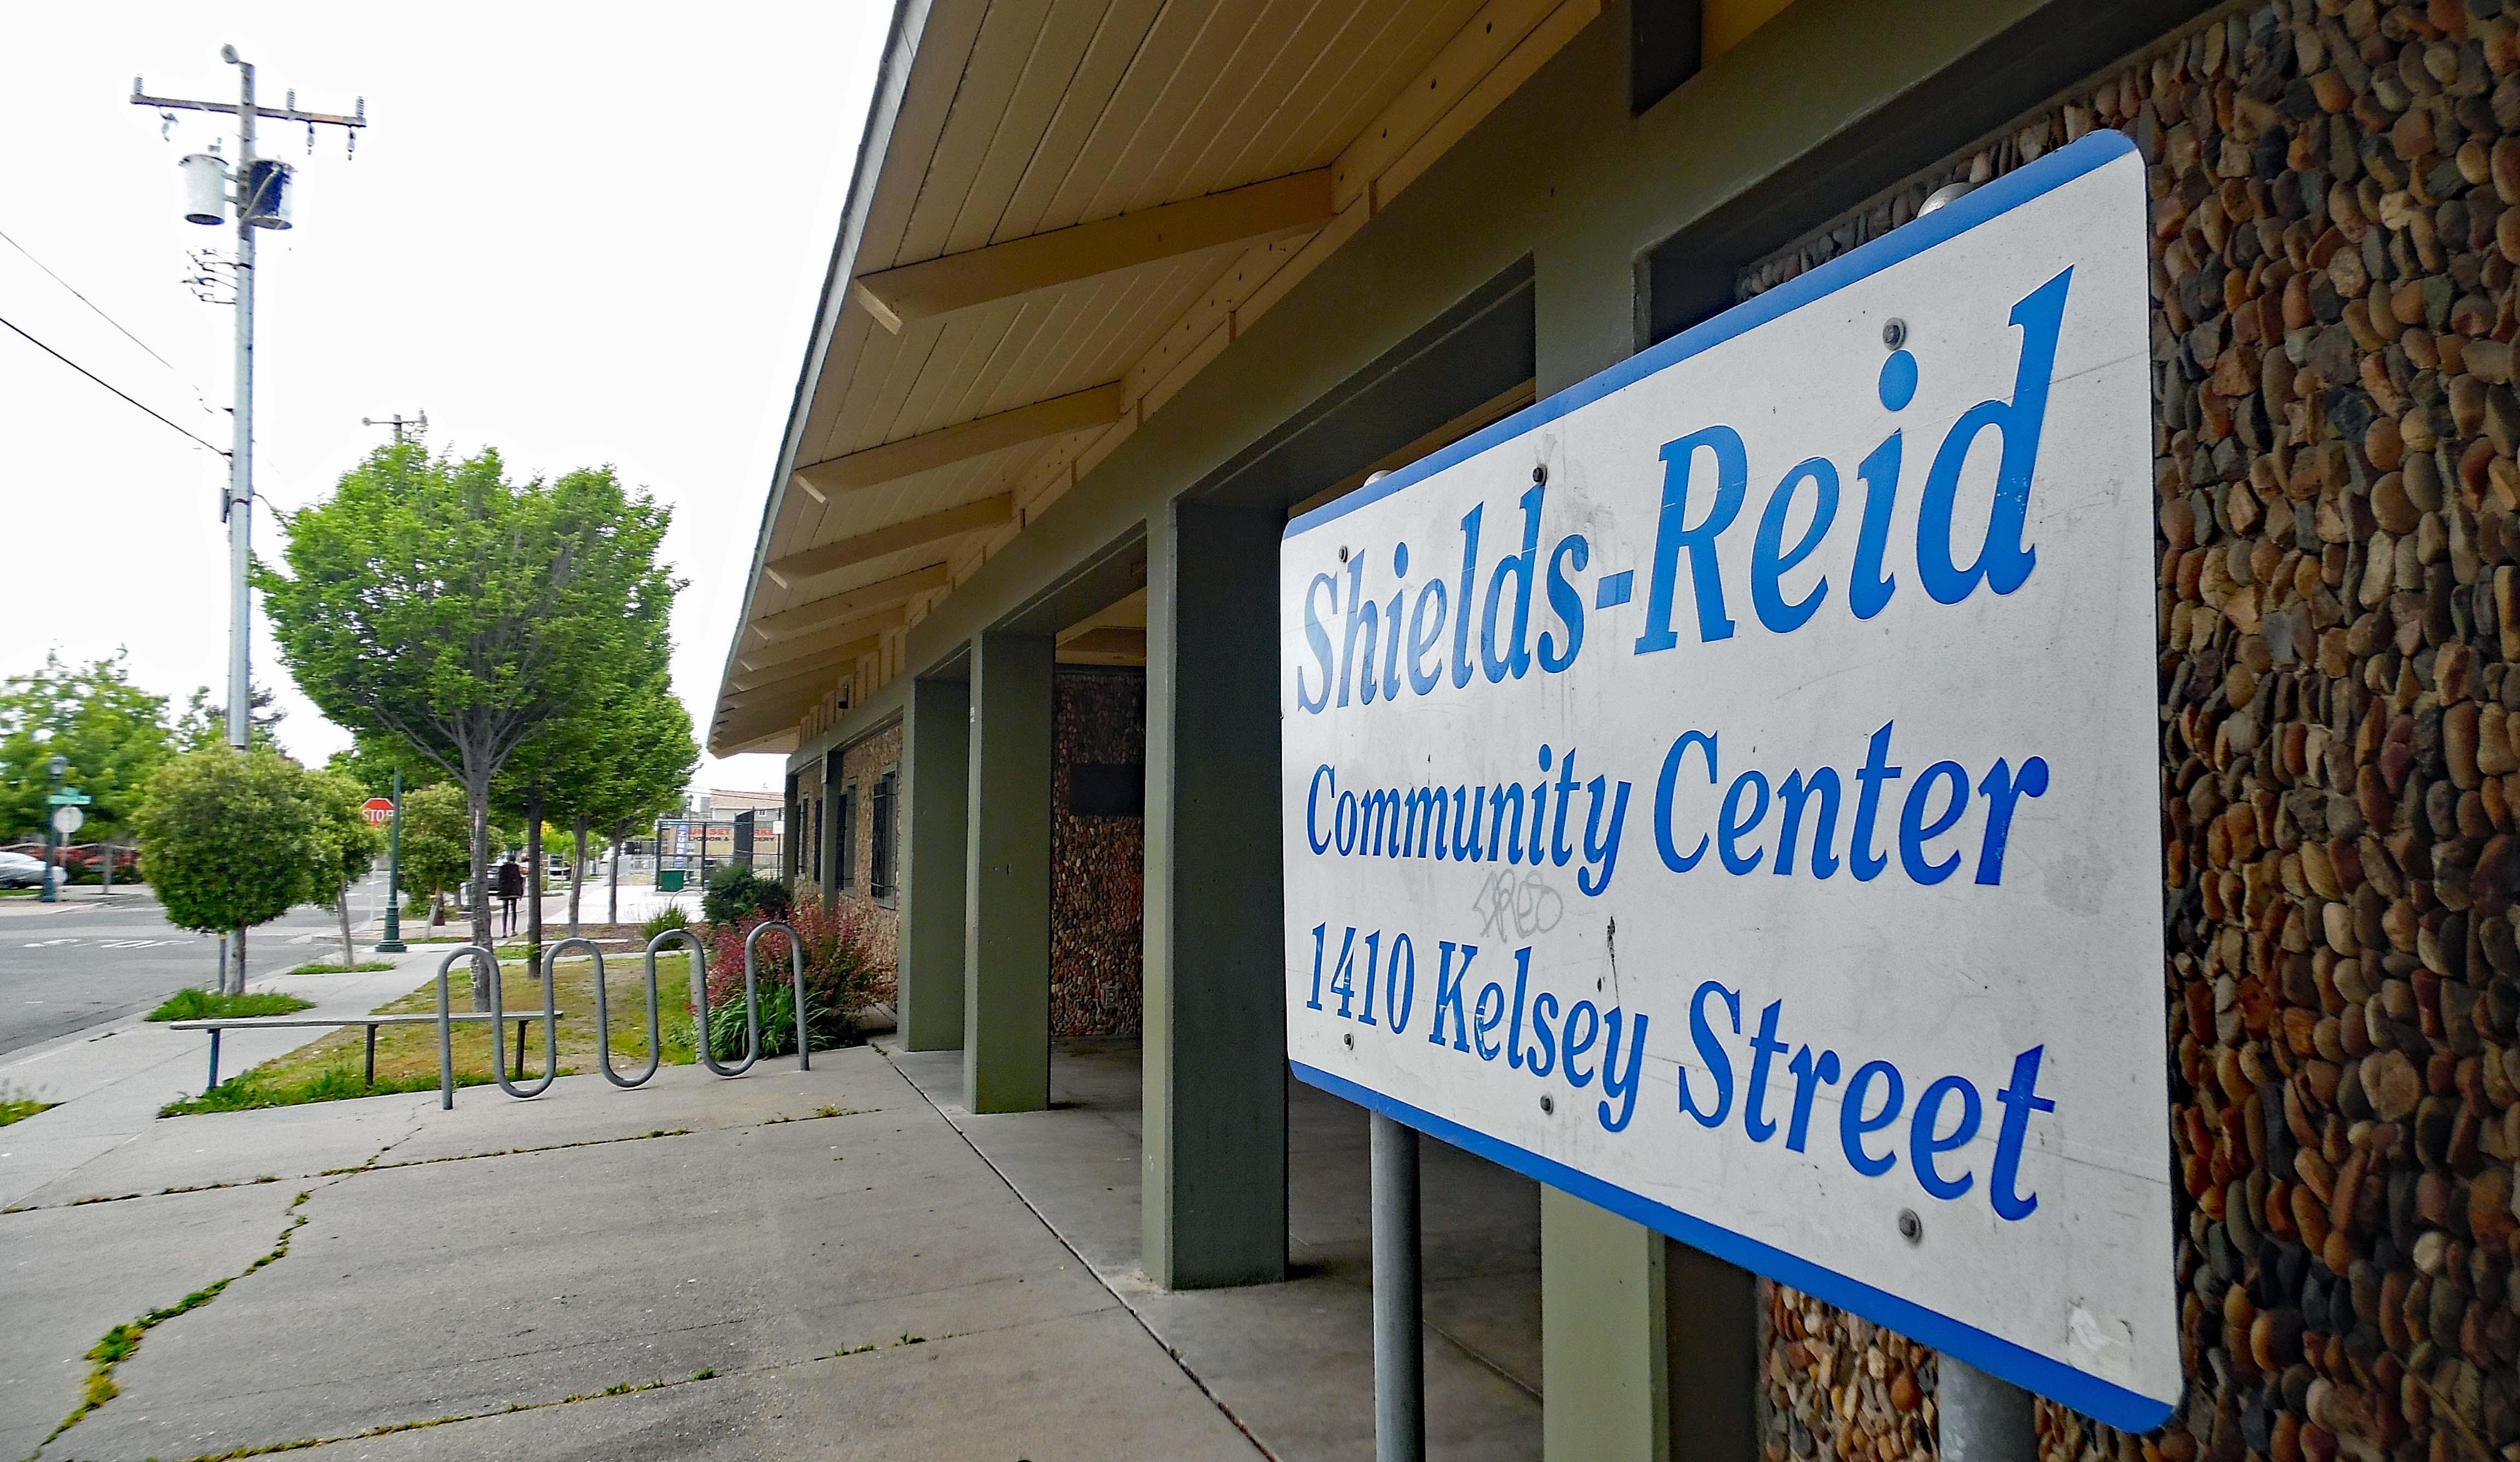 3rd annual Shields-Reid Community Chess Tournament set for Sept. 8